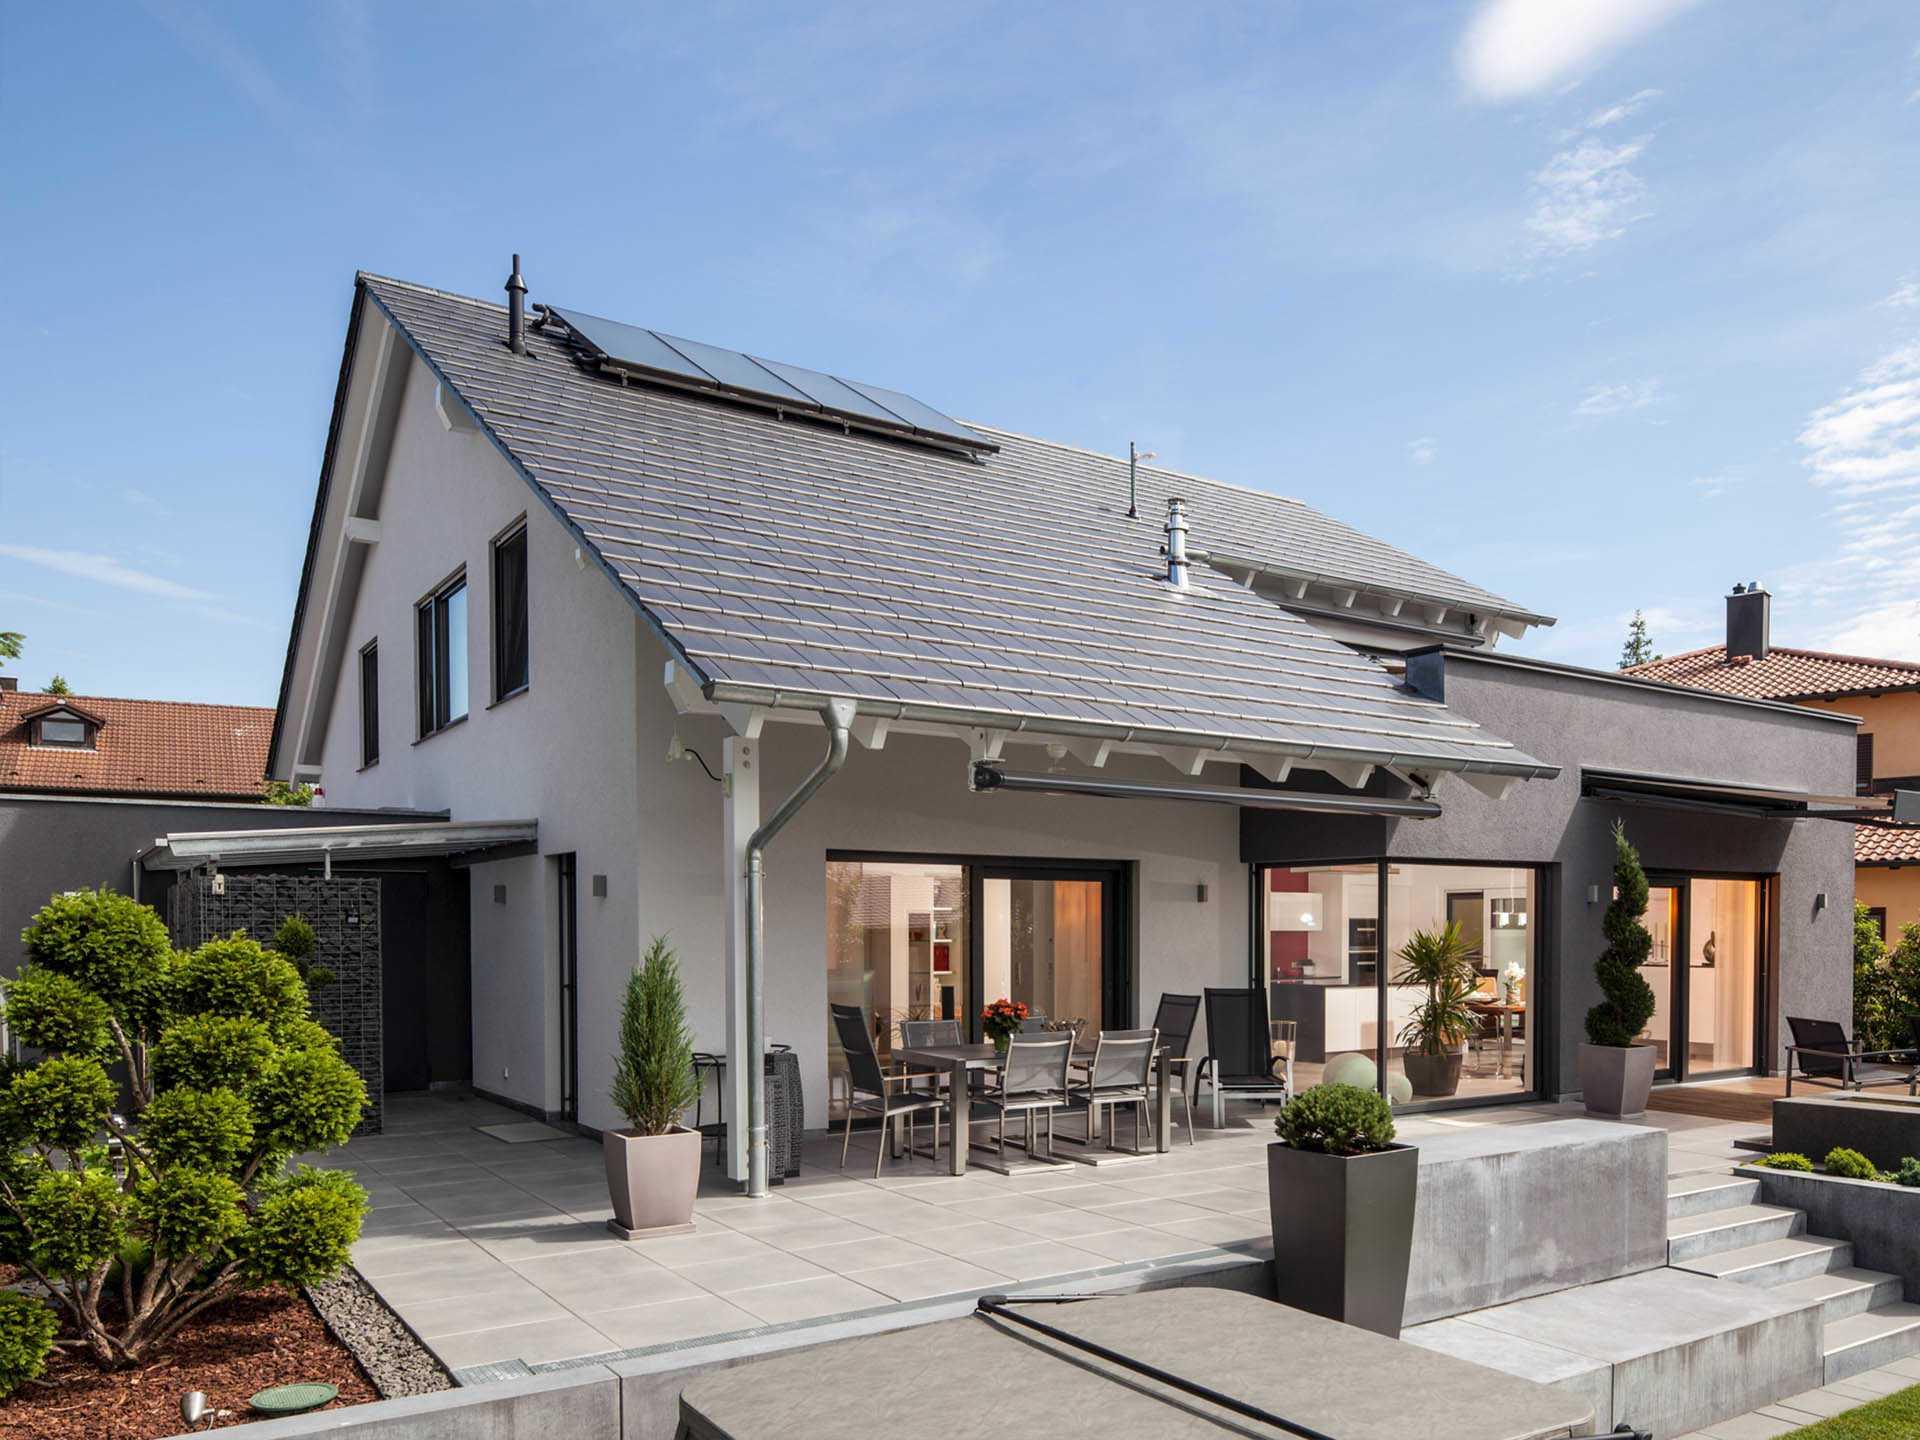 Bauunternehmumg Böpple Haus Uthoff